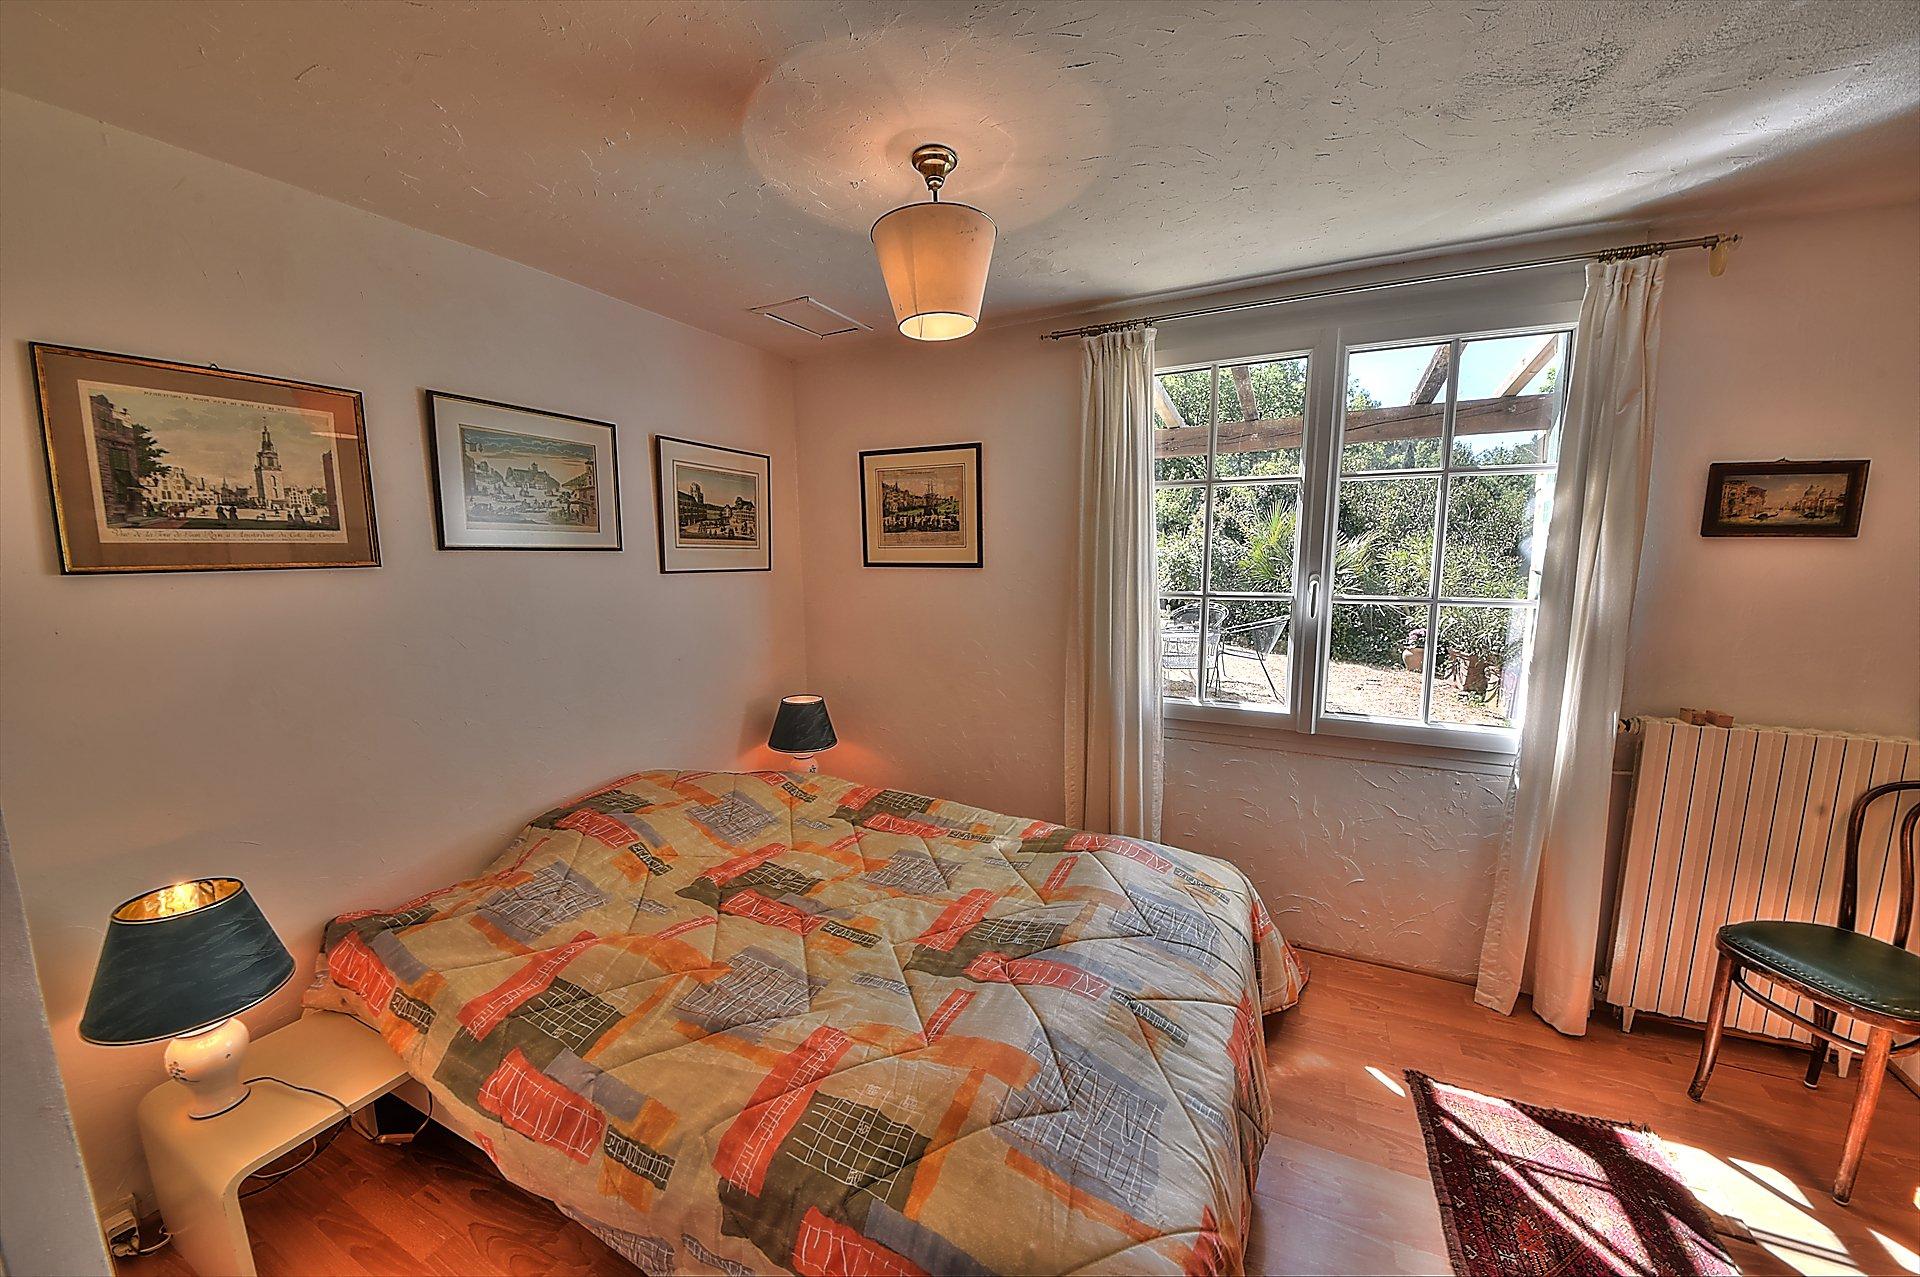 Bedroom 1 on the groundfloor